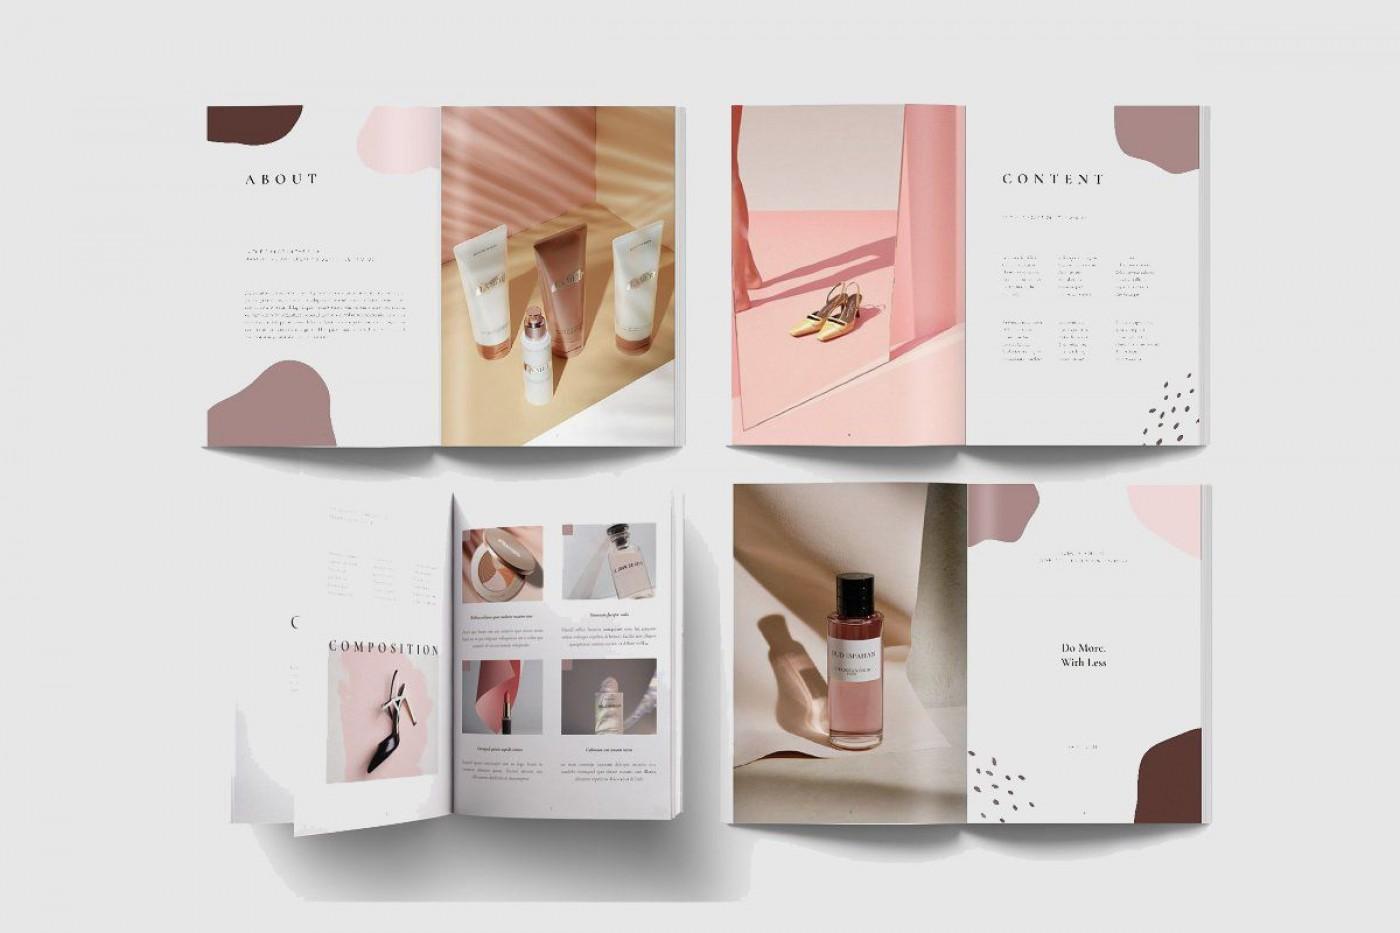 008 Impressive In Design Portfolio Template  Free Indesign A3 Photography Graphic Download1400